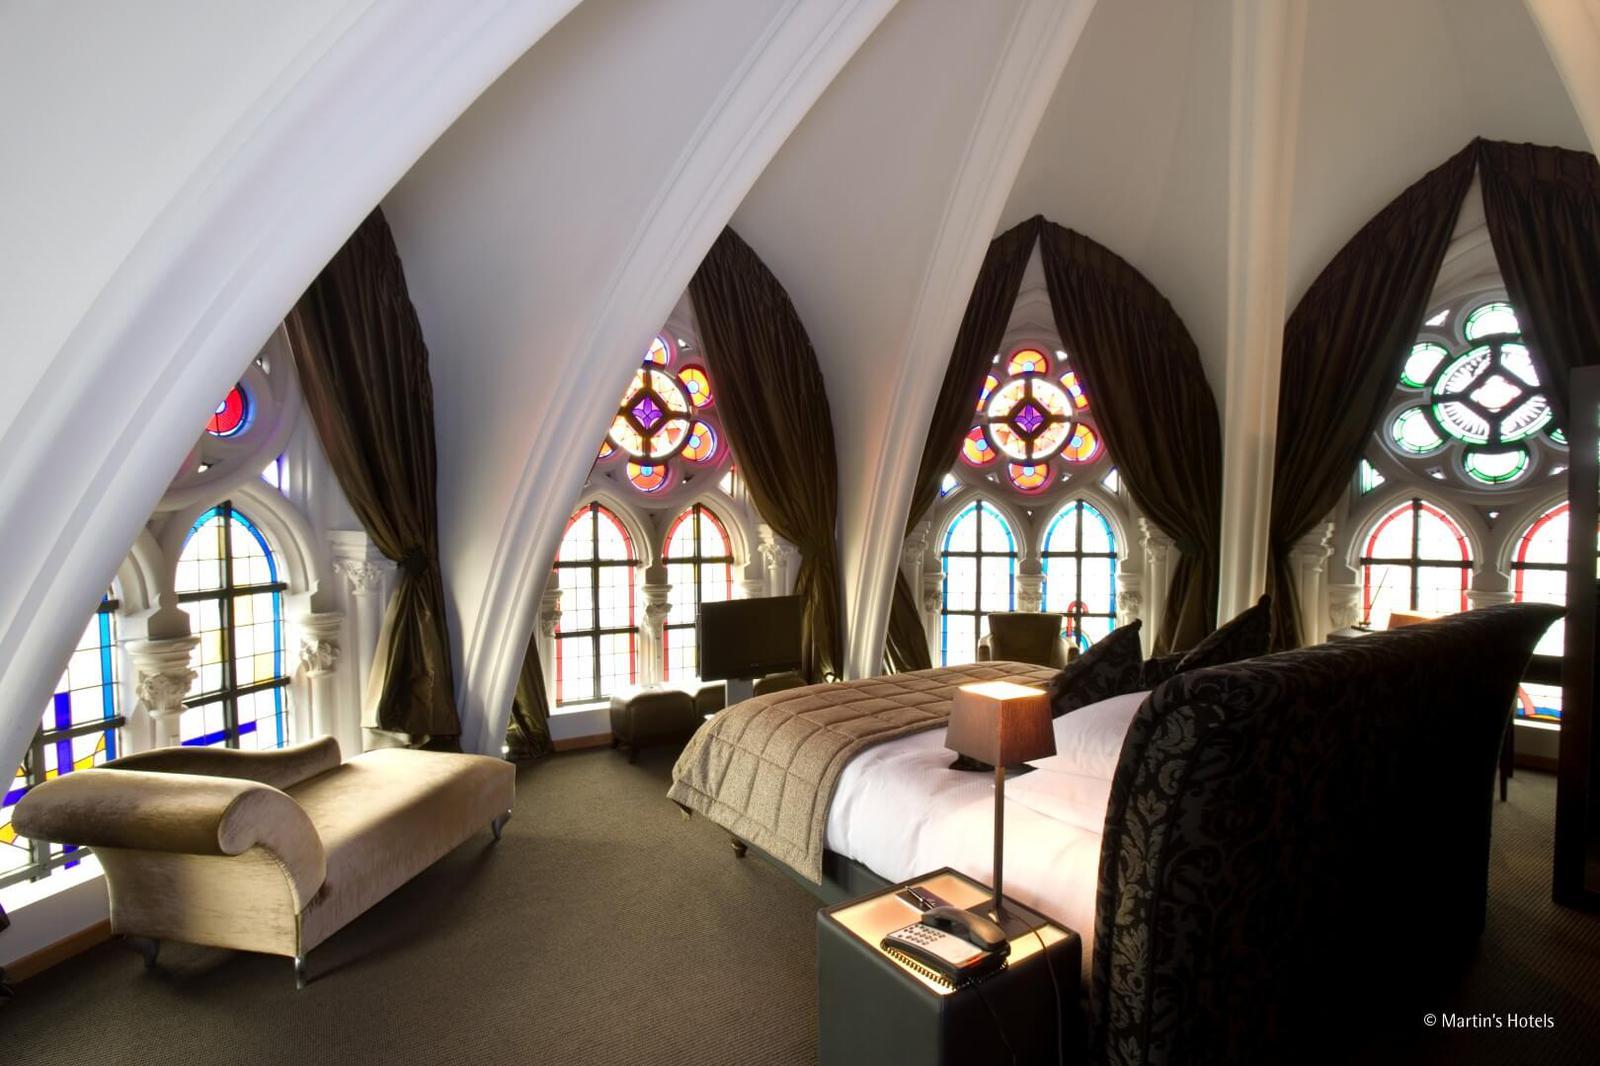 hoteles raros Martin's Patershof